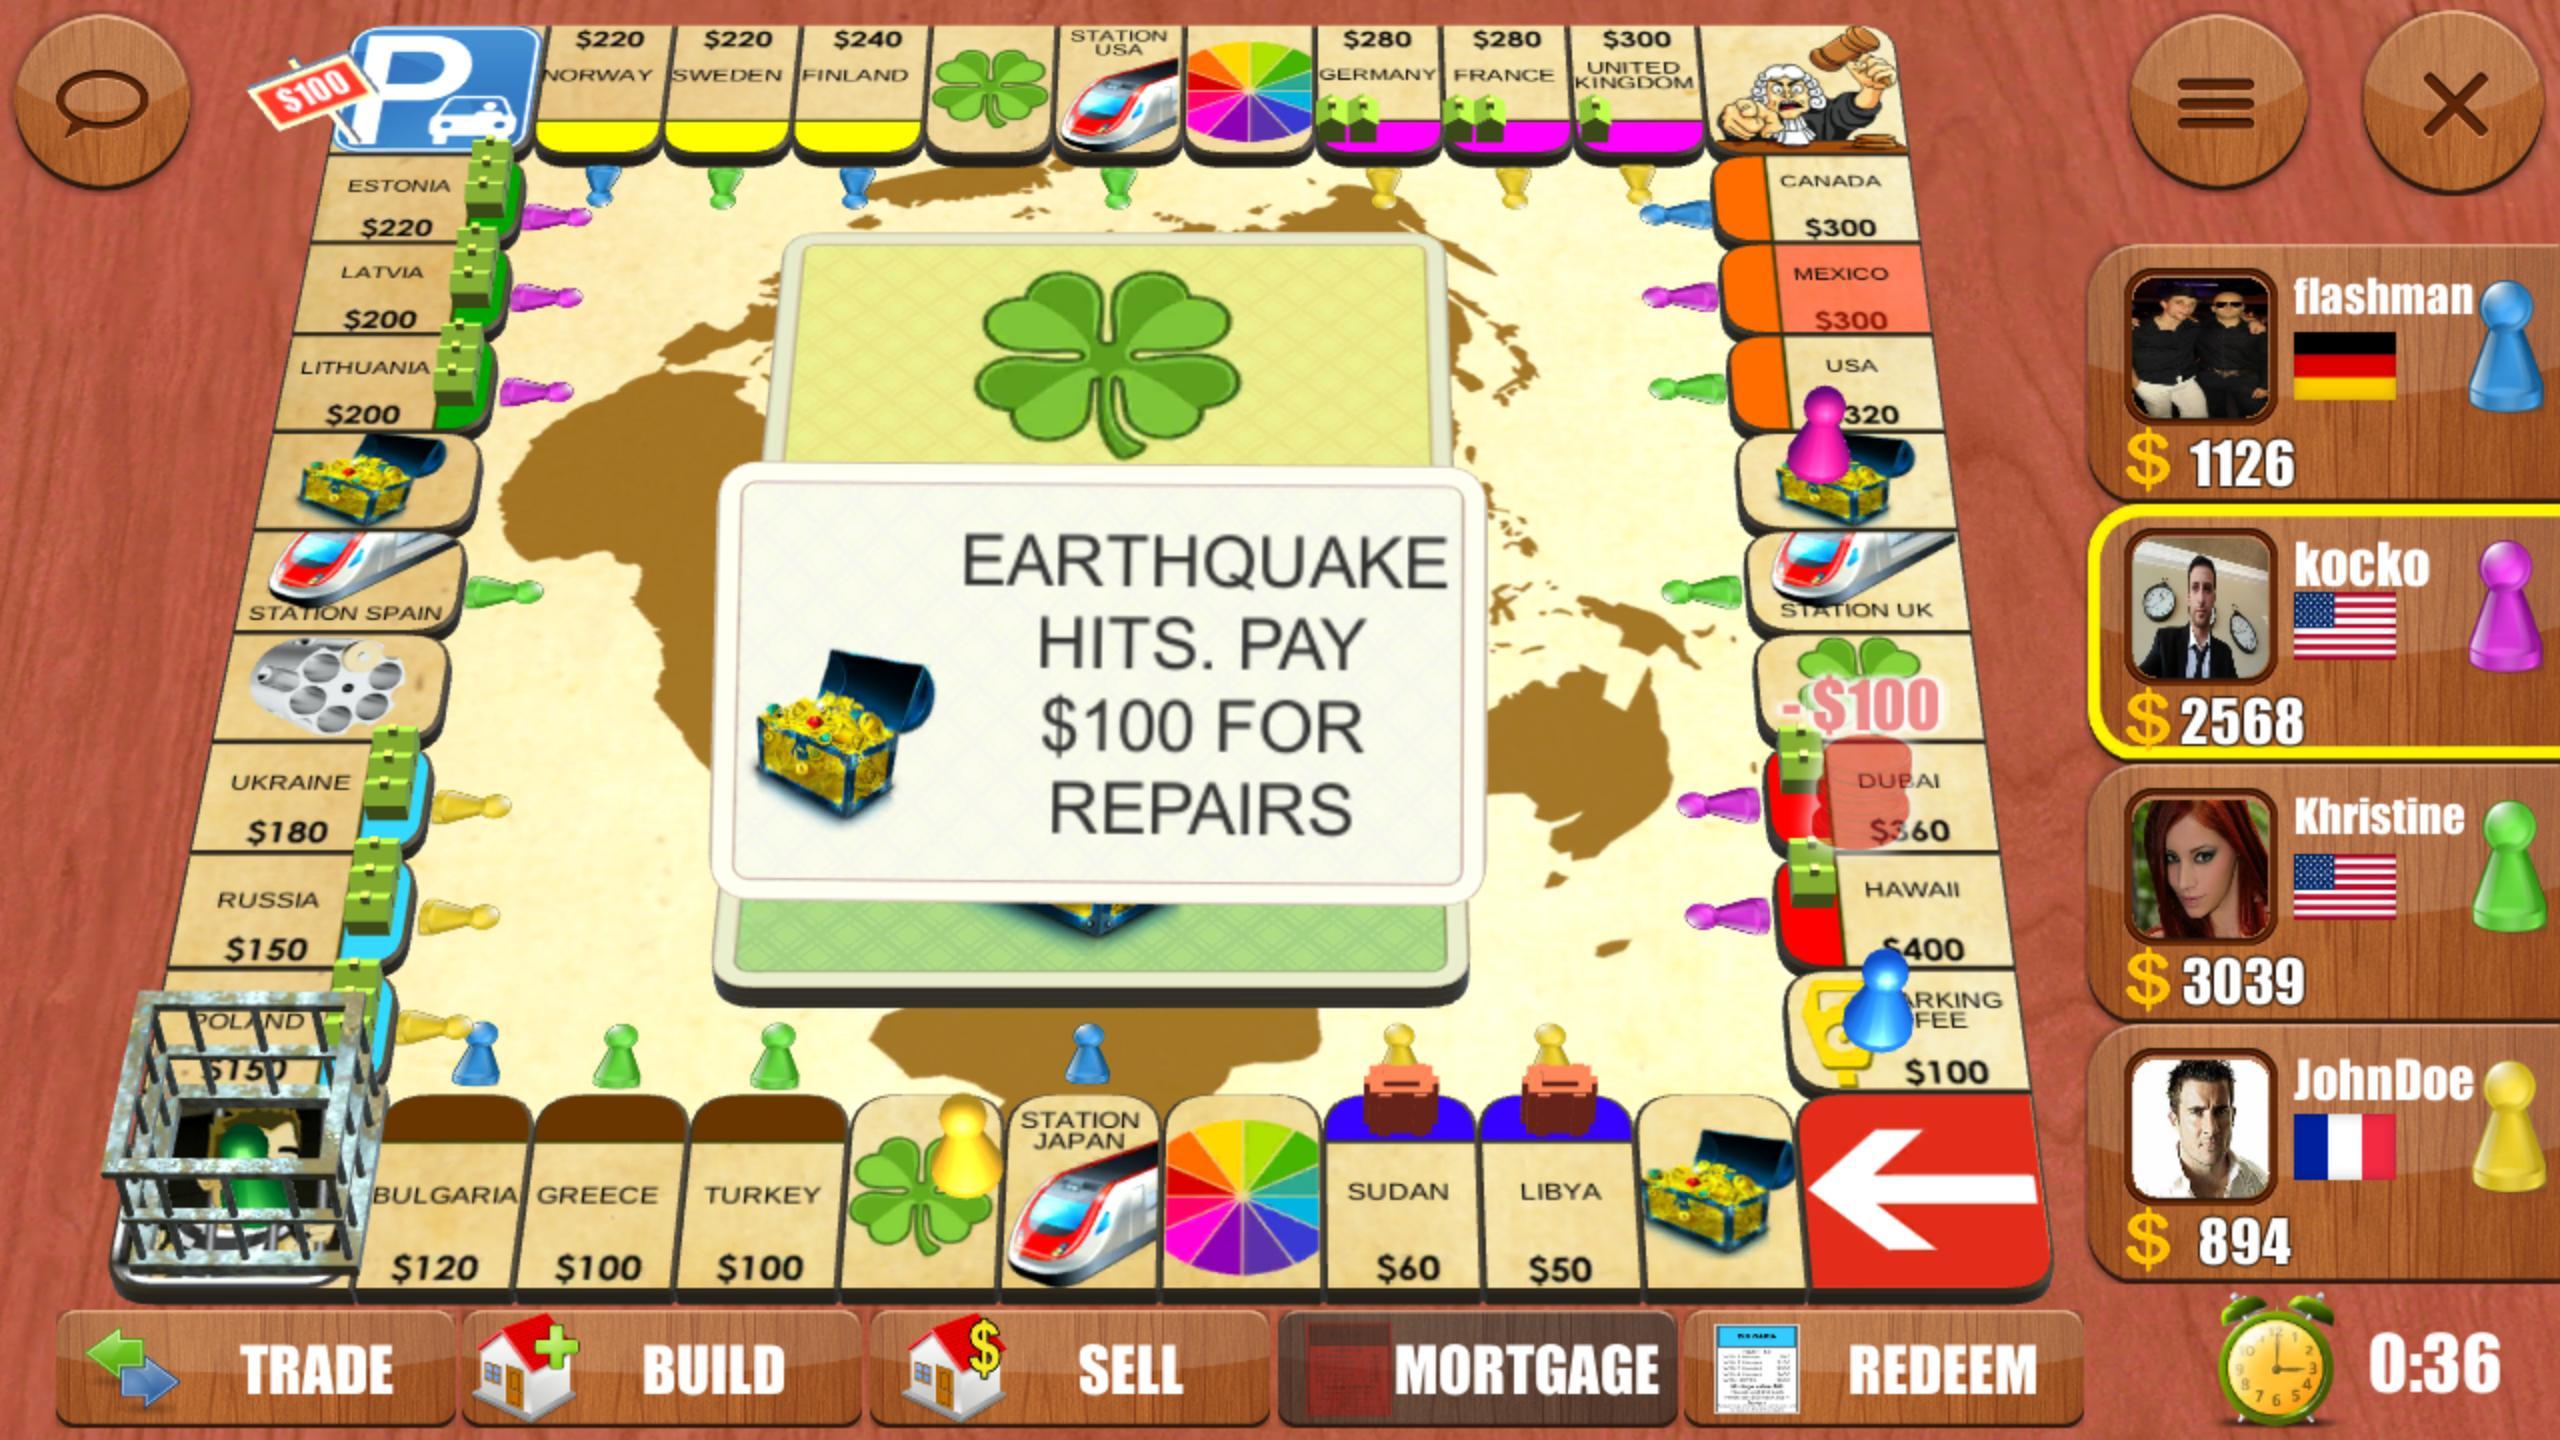 Rento Dice Board Game Online 5.1.9 Screenshot 14